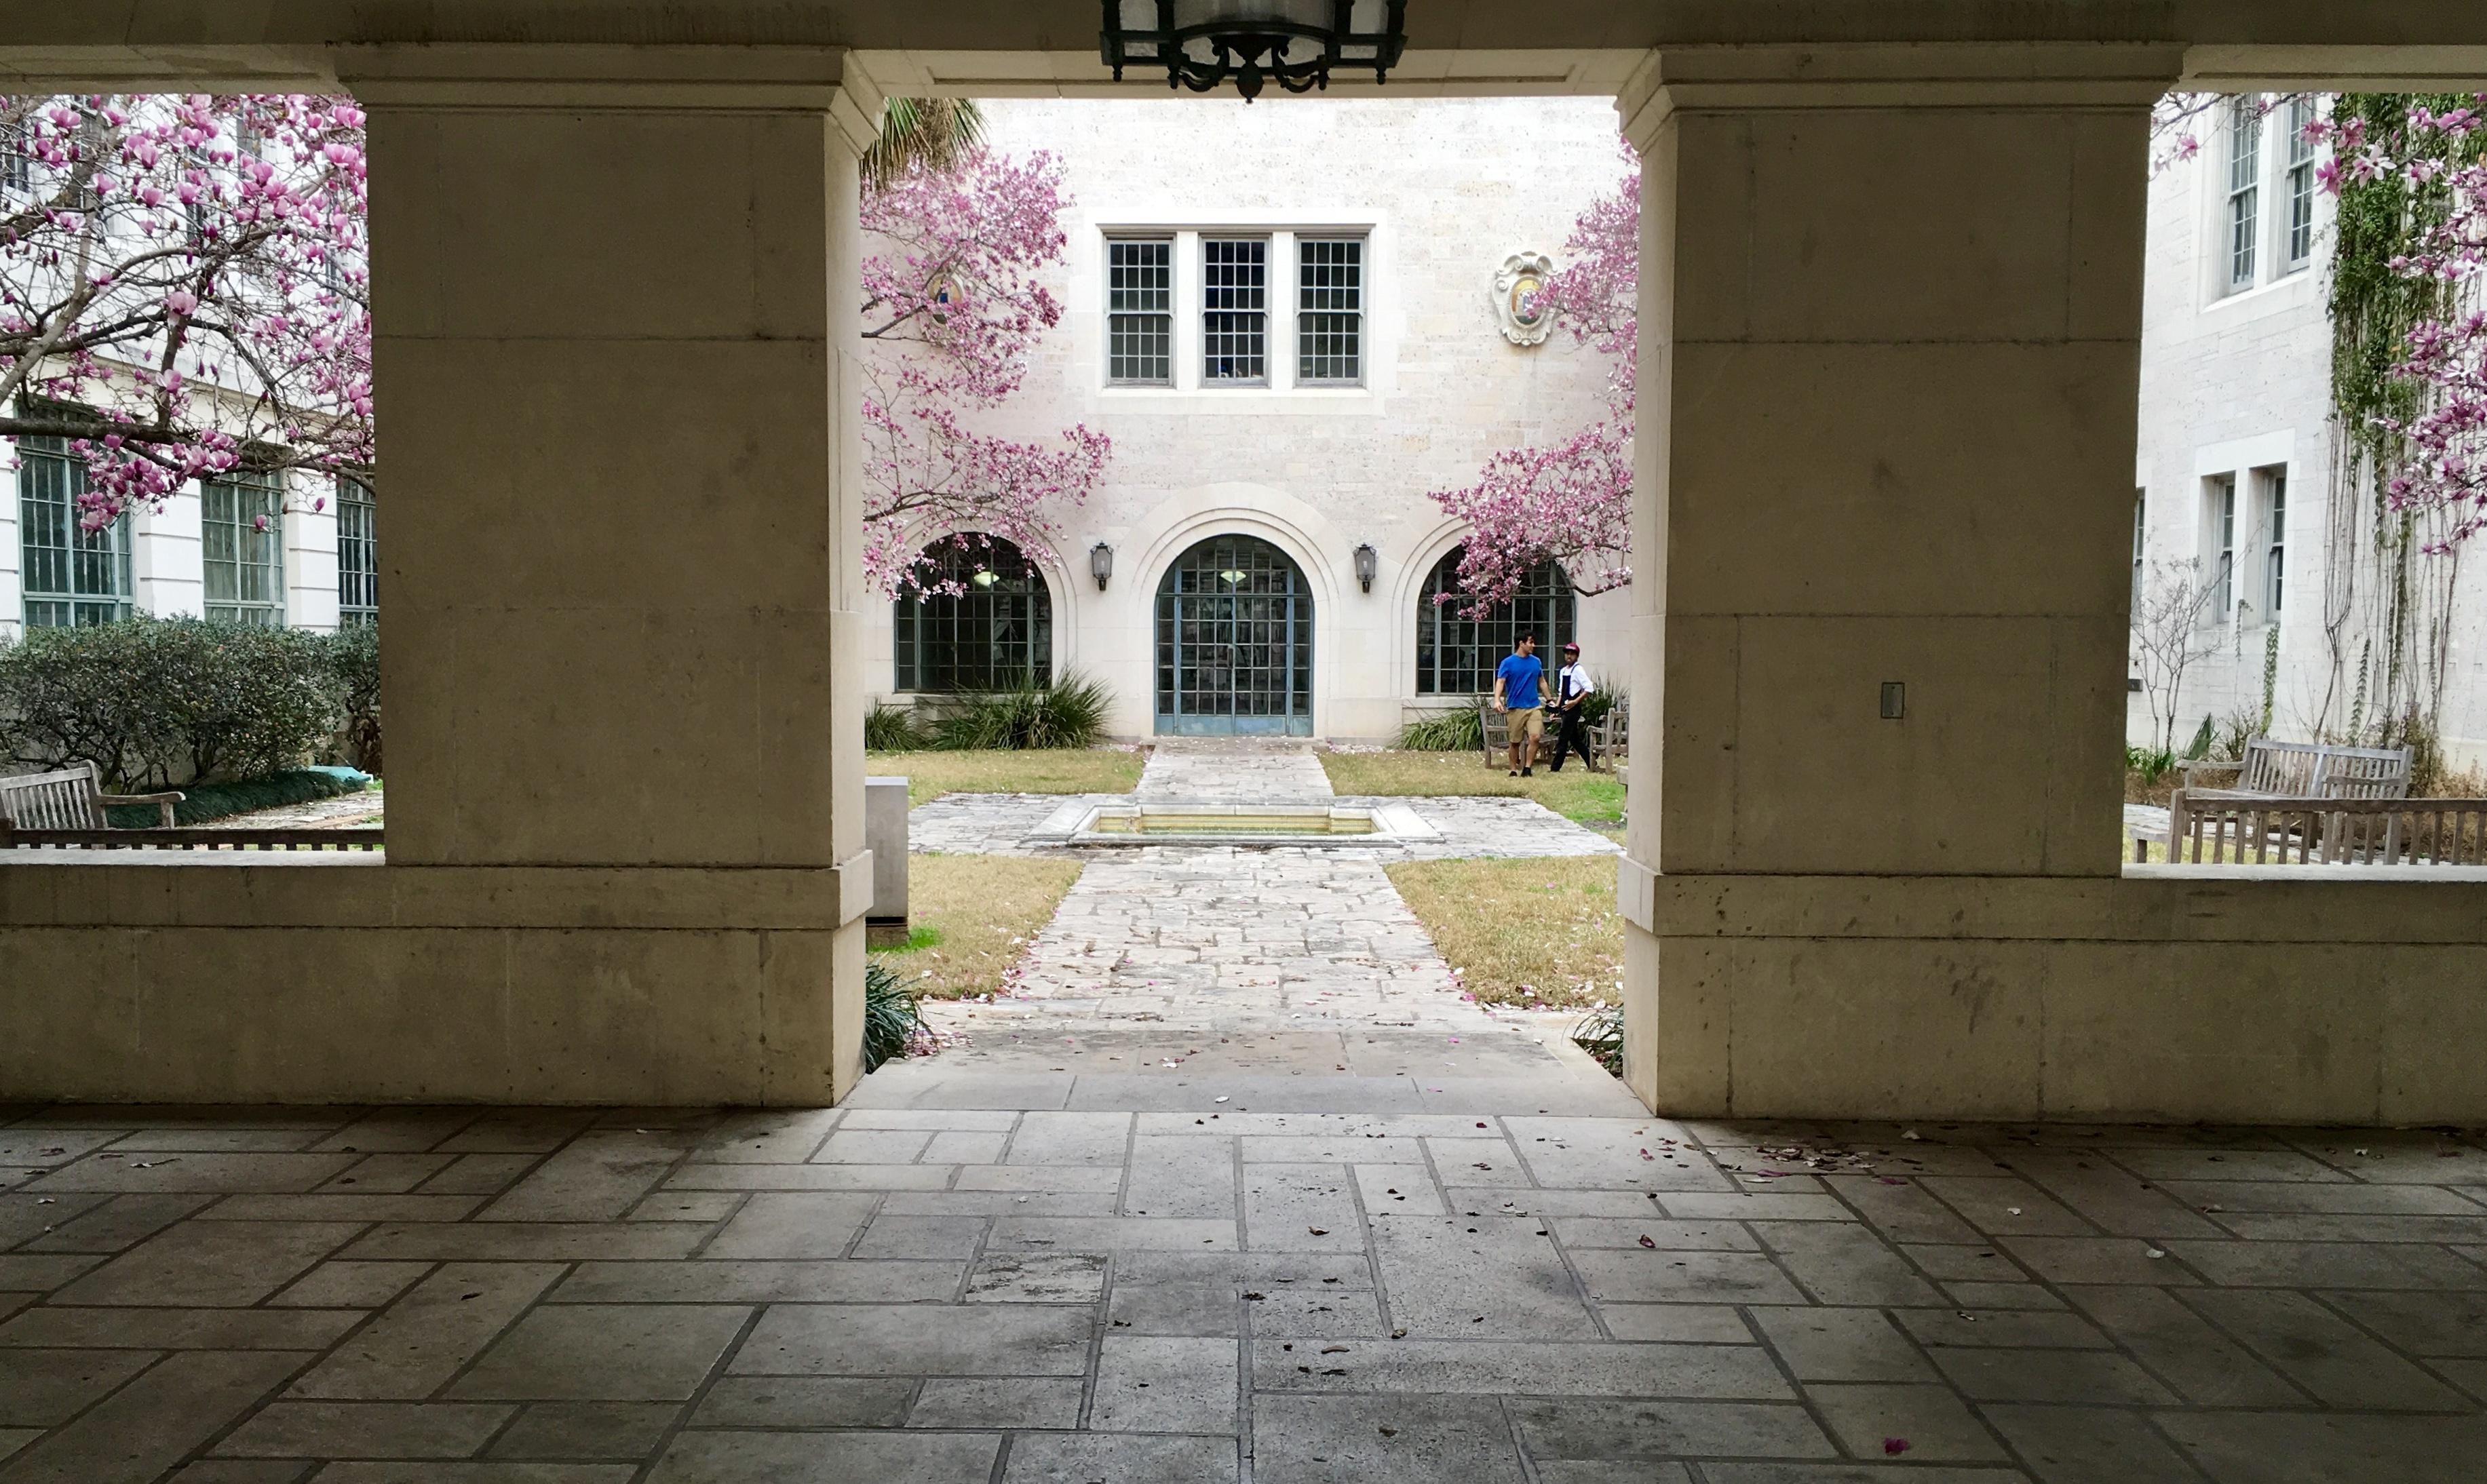 Saucer Magnolias bloom in Goldsmith Hall's Courtyard.